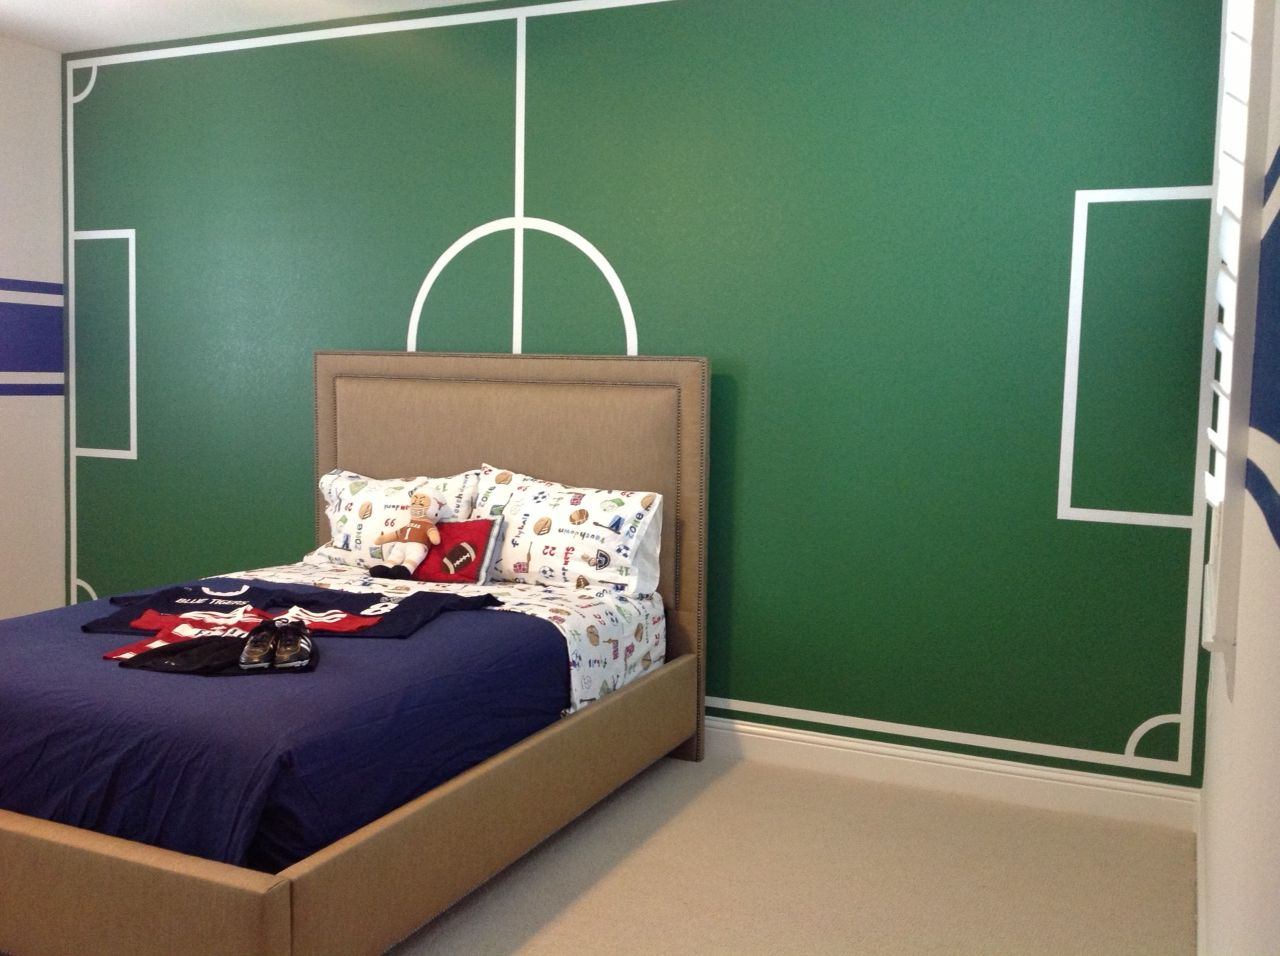 astounding soccer bedroom ideas | Boys Soccer Painted Soccer Field Sports Room | Soccer room ...